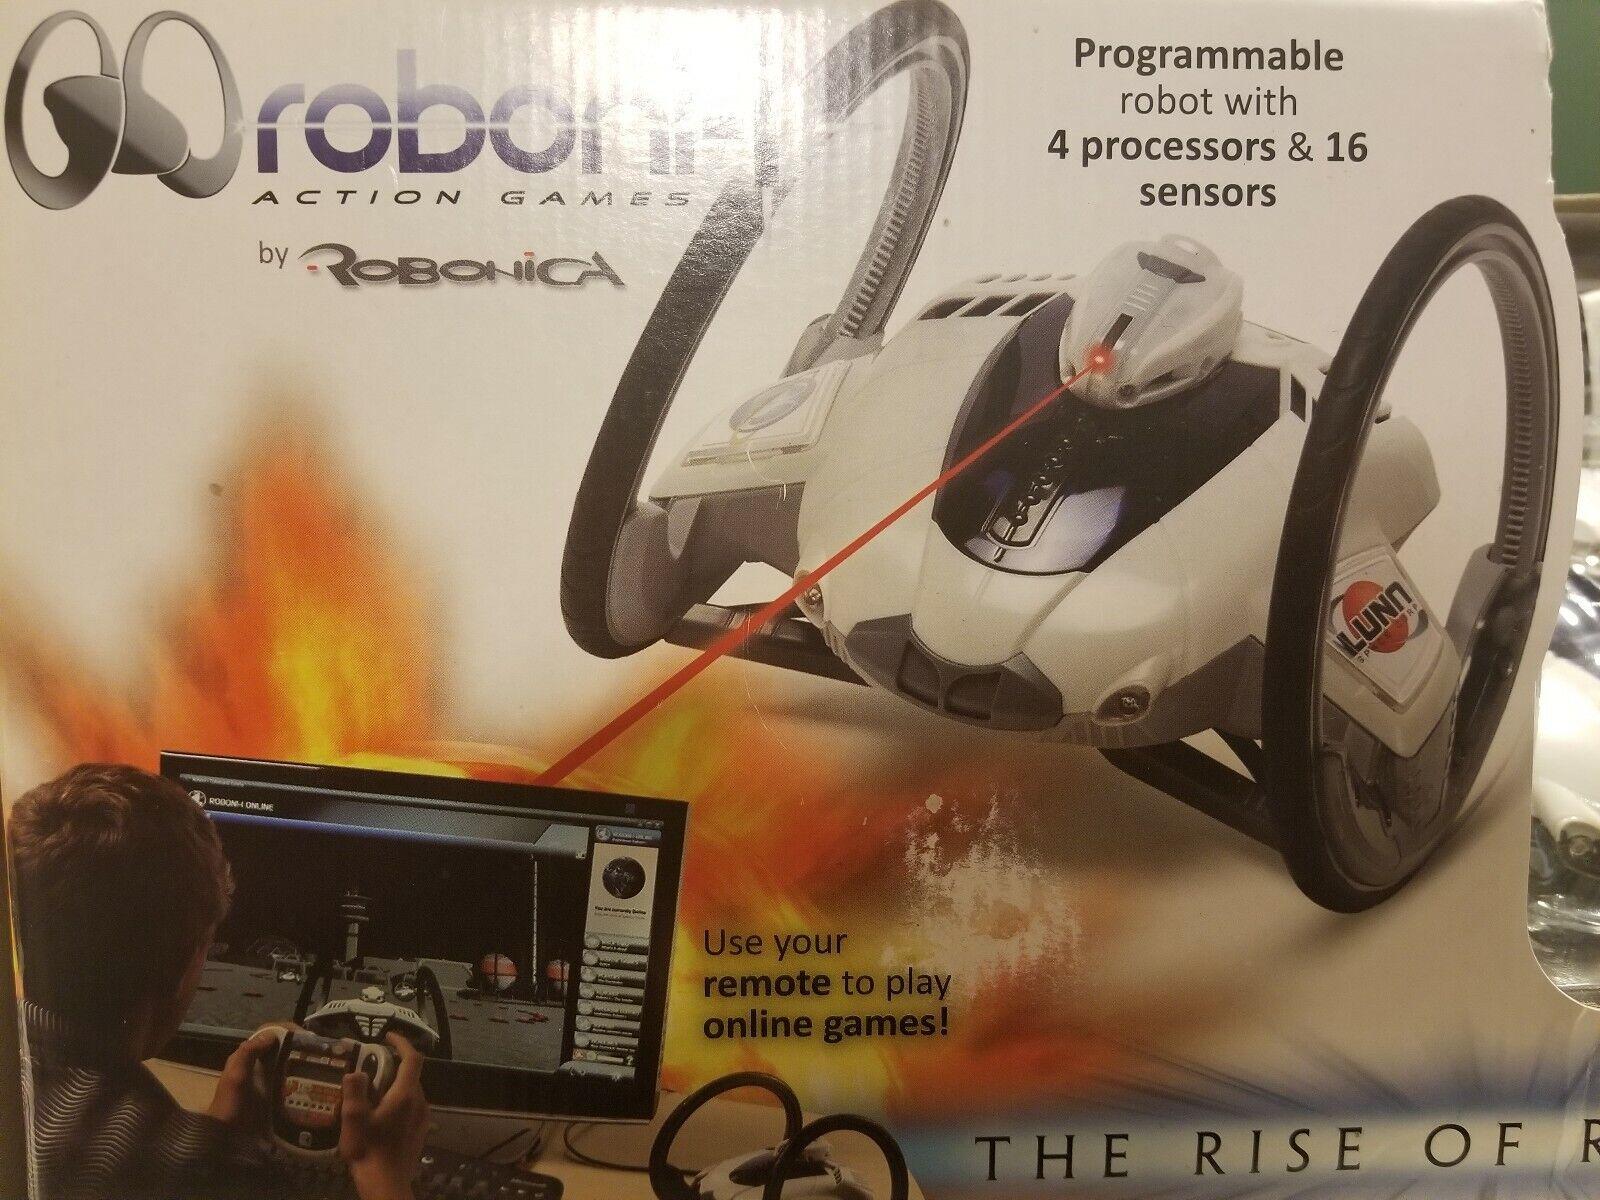 Robonica Robotics Roboni-i Programmable PC Interactive Gaming Gaming Gaming Robot 75b711